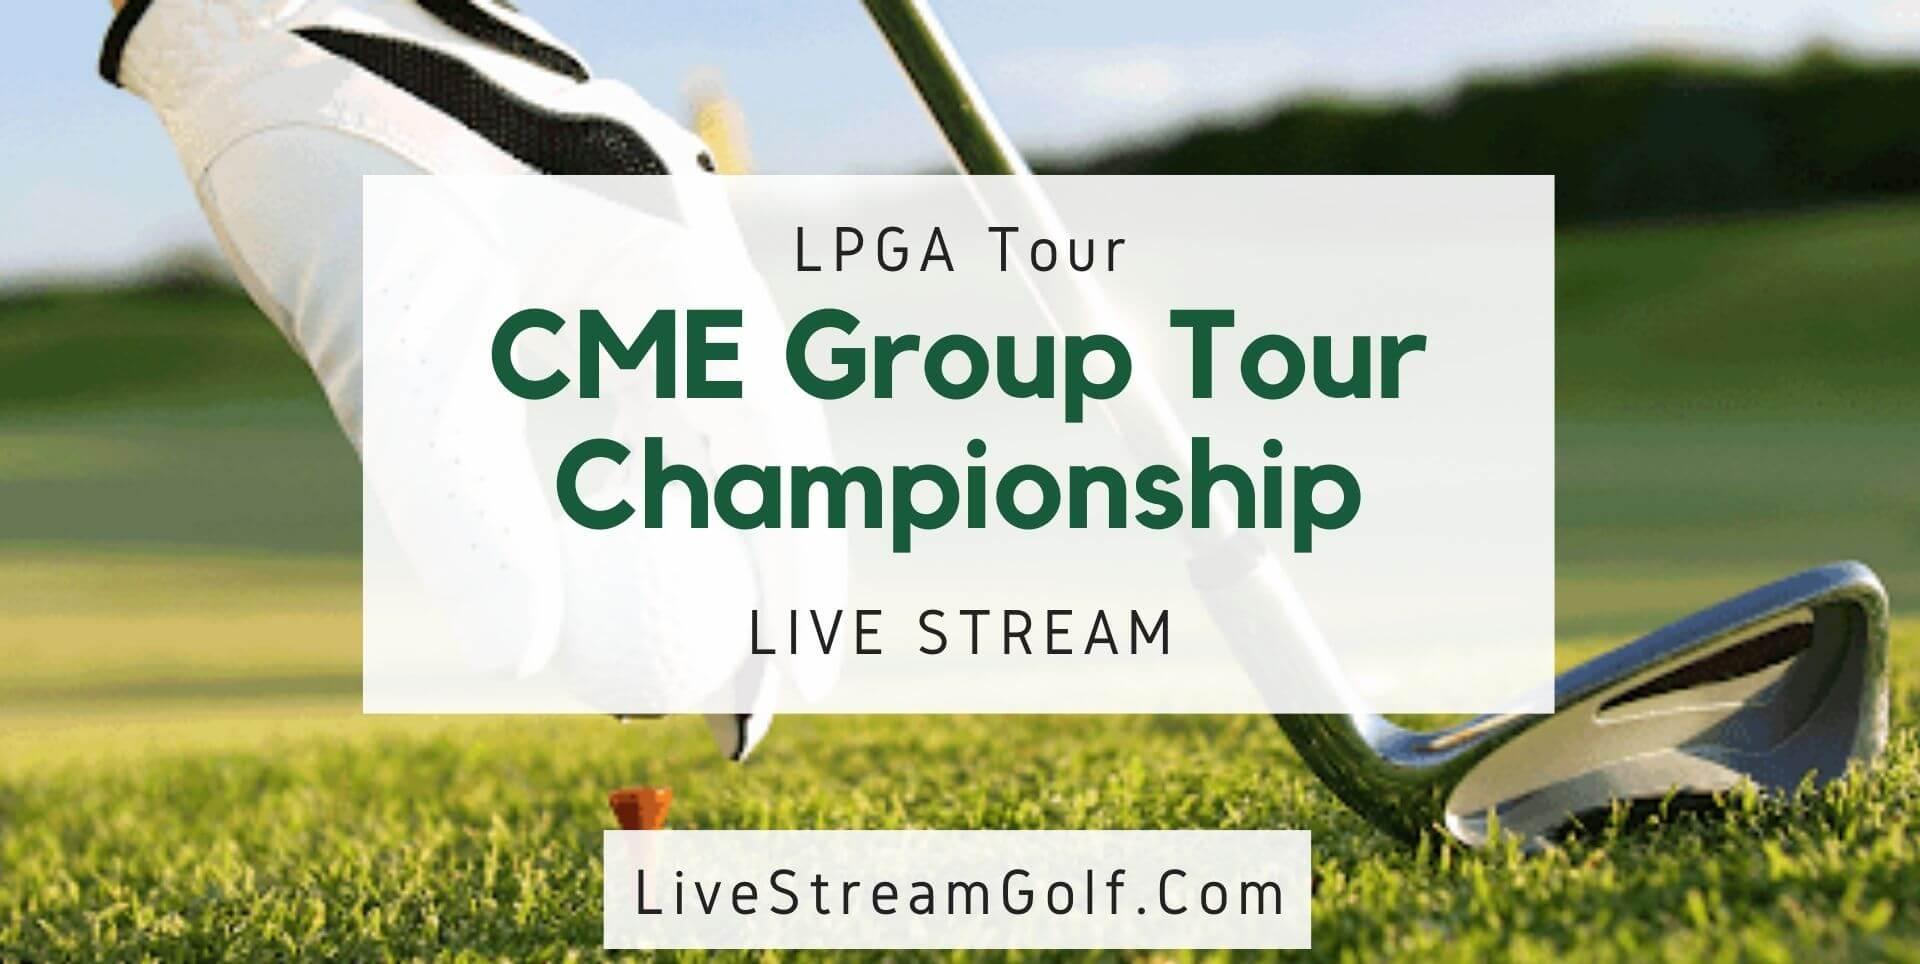 CME Group Tour Championship Rd 3 Live Stream: LPGA Tour 2021